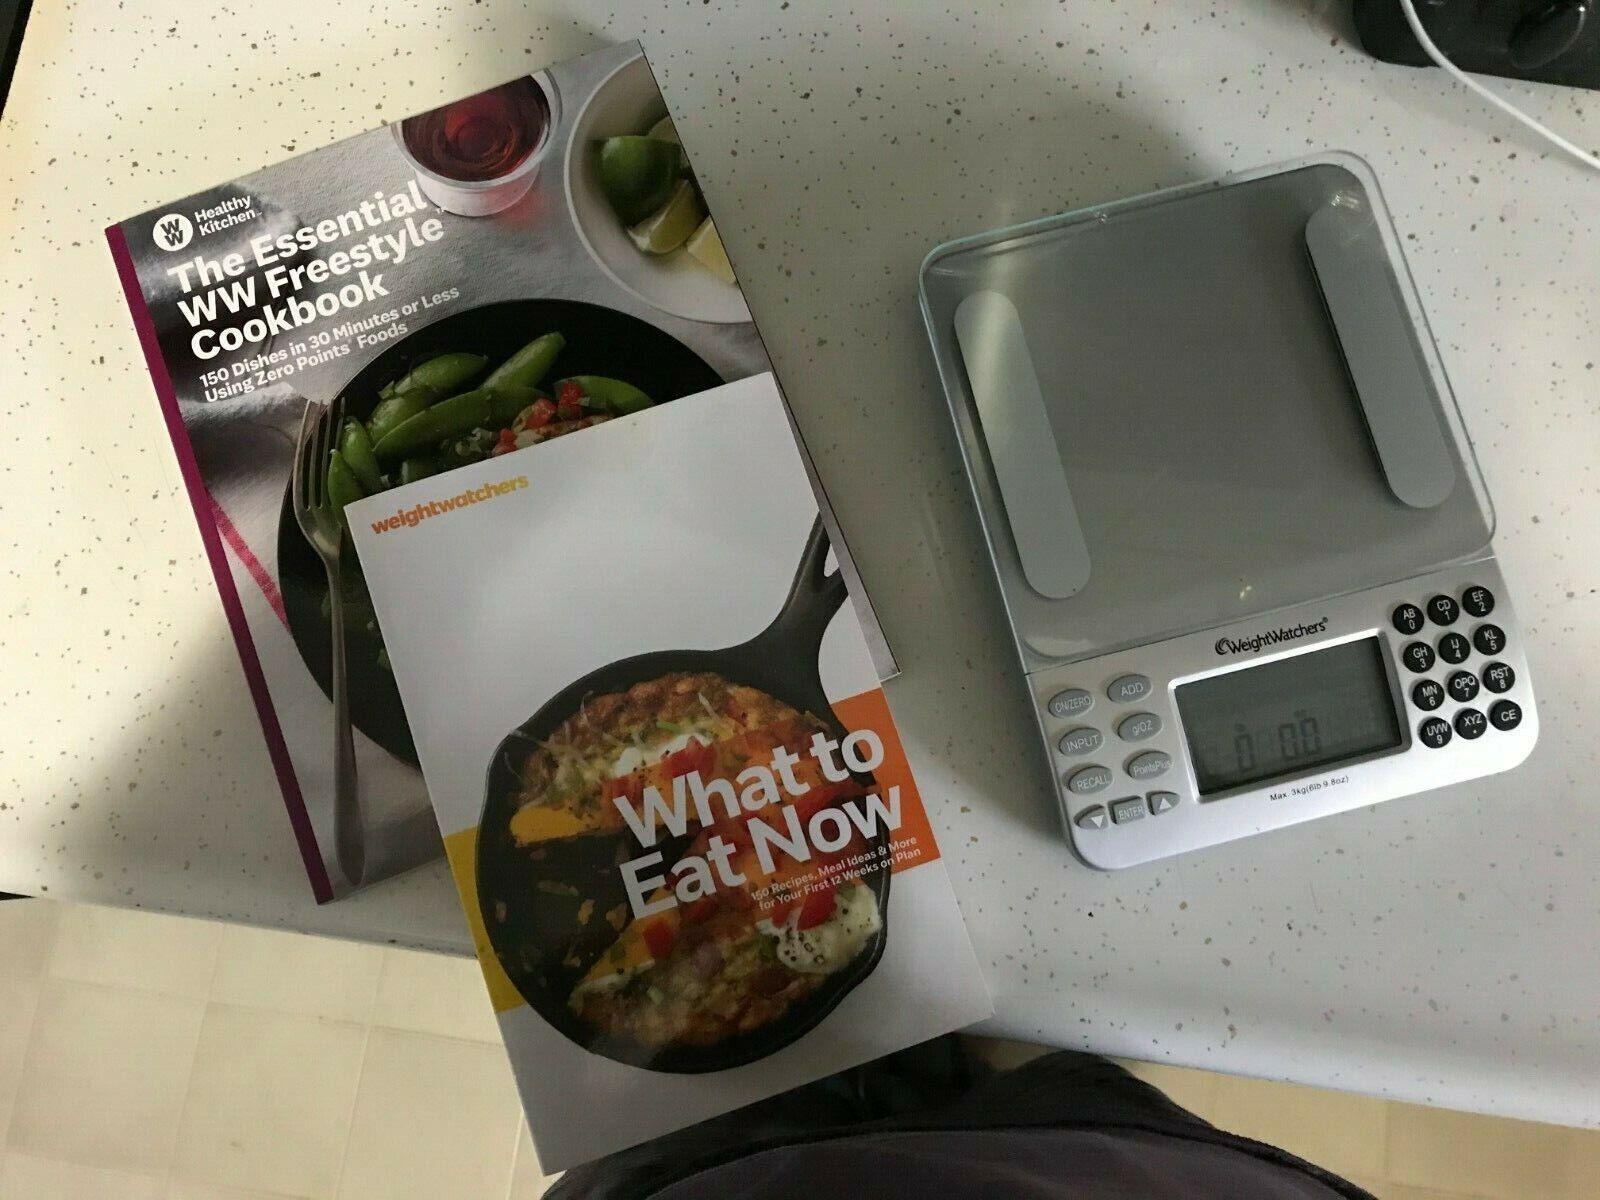 Kitchen Food Scale & Cookbooks